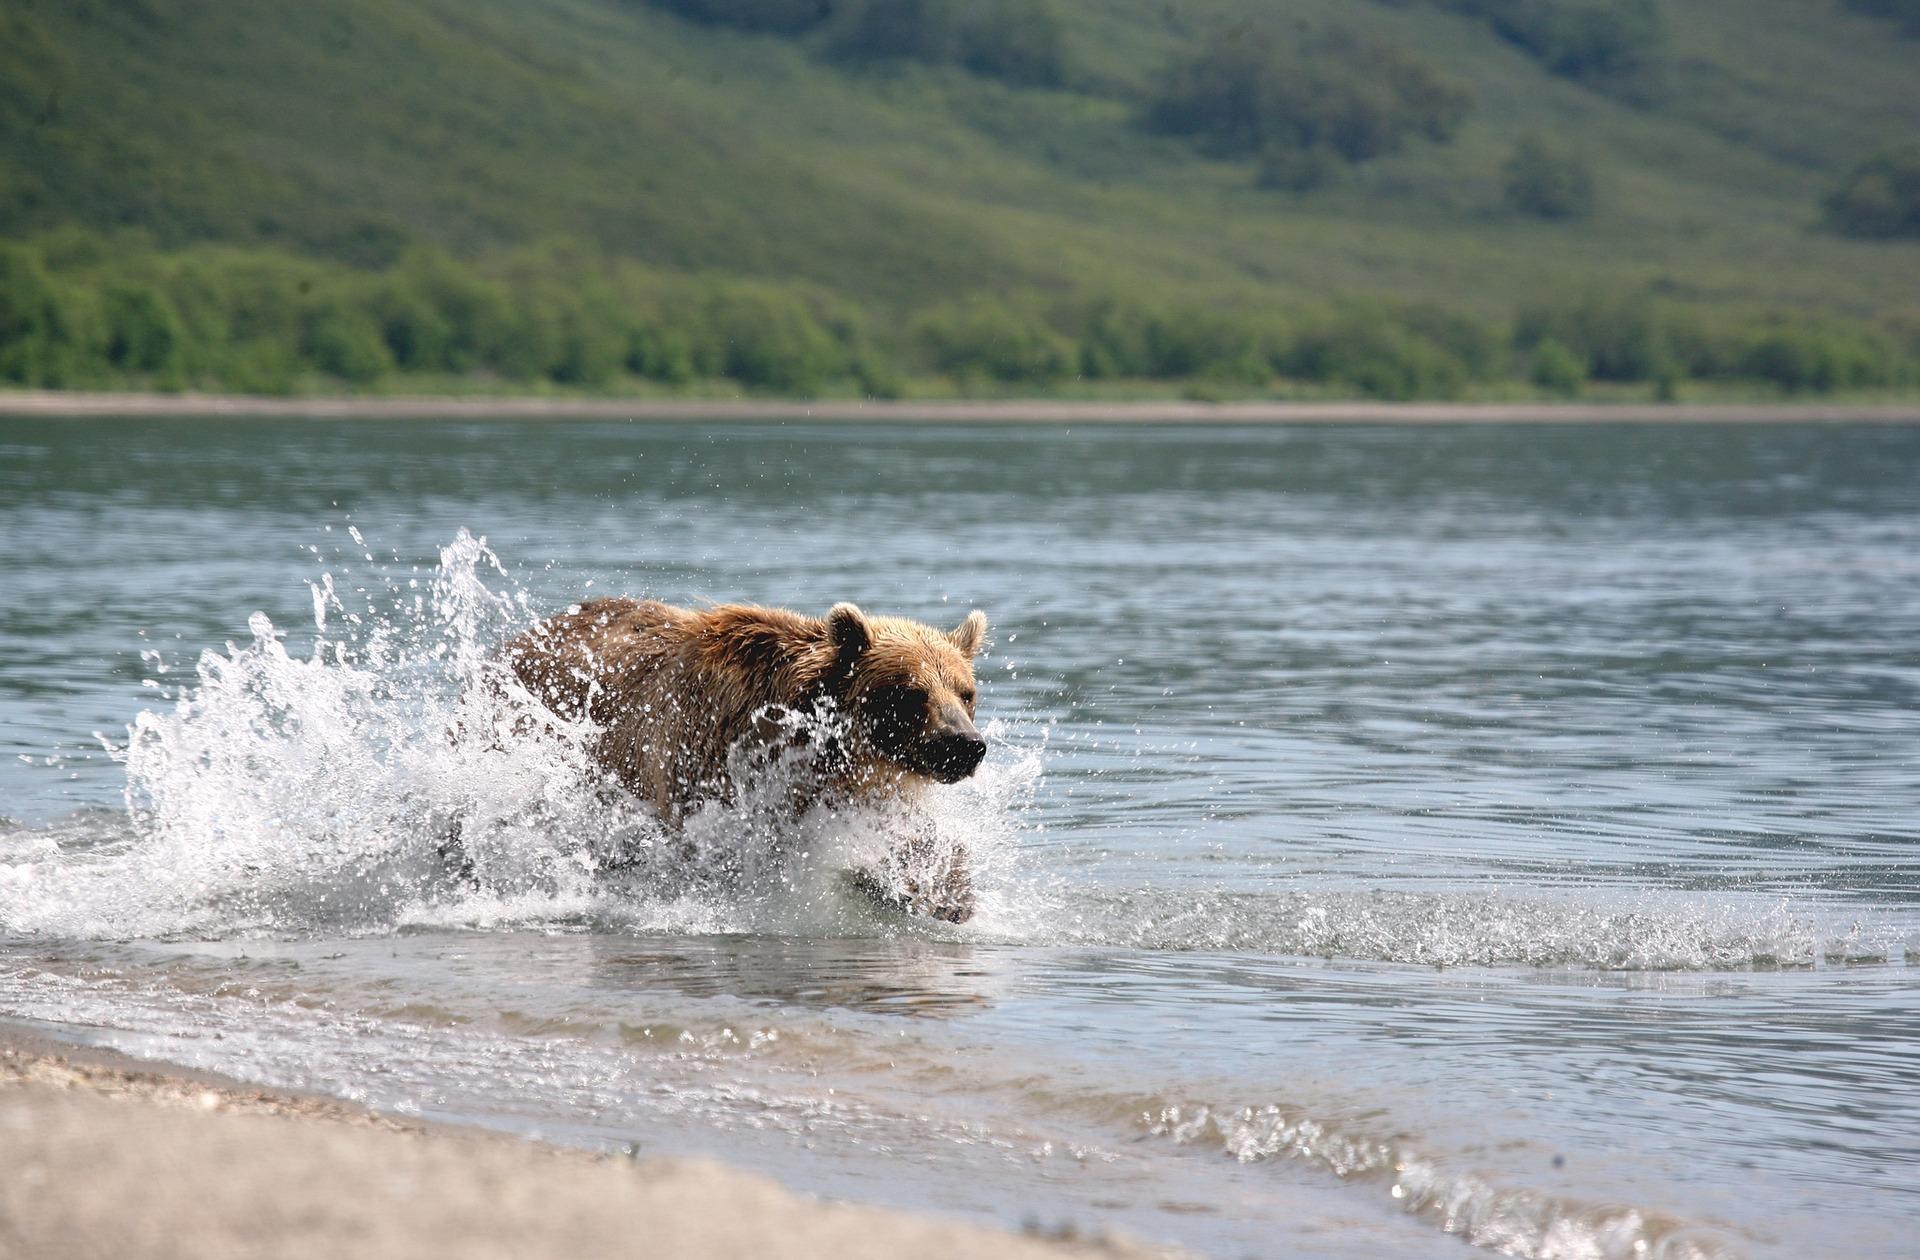 This is a picture of a bear in a lake. It's not Bear Lake, but it's close enough. Courtesy of pixabay.com